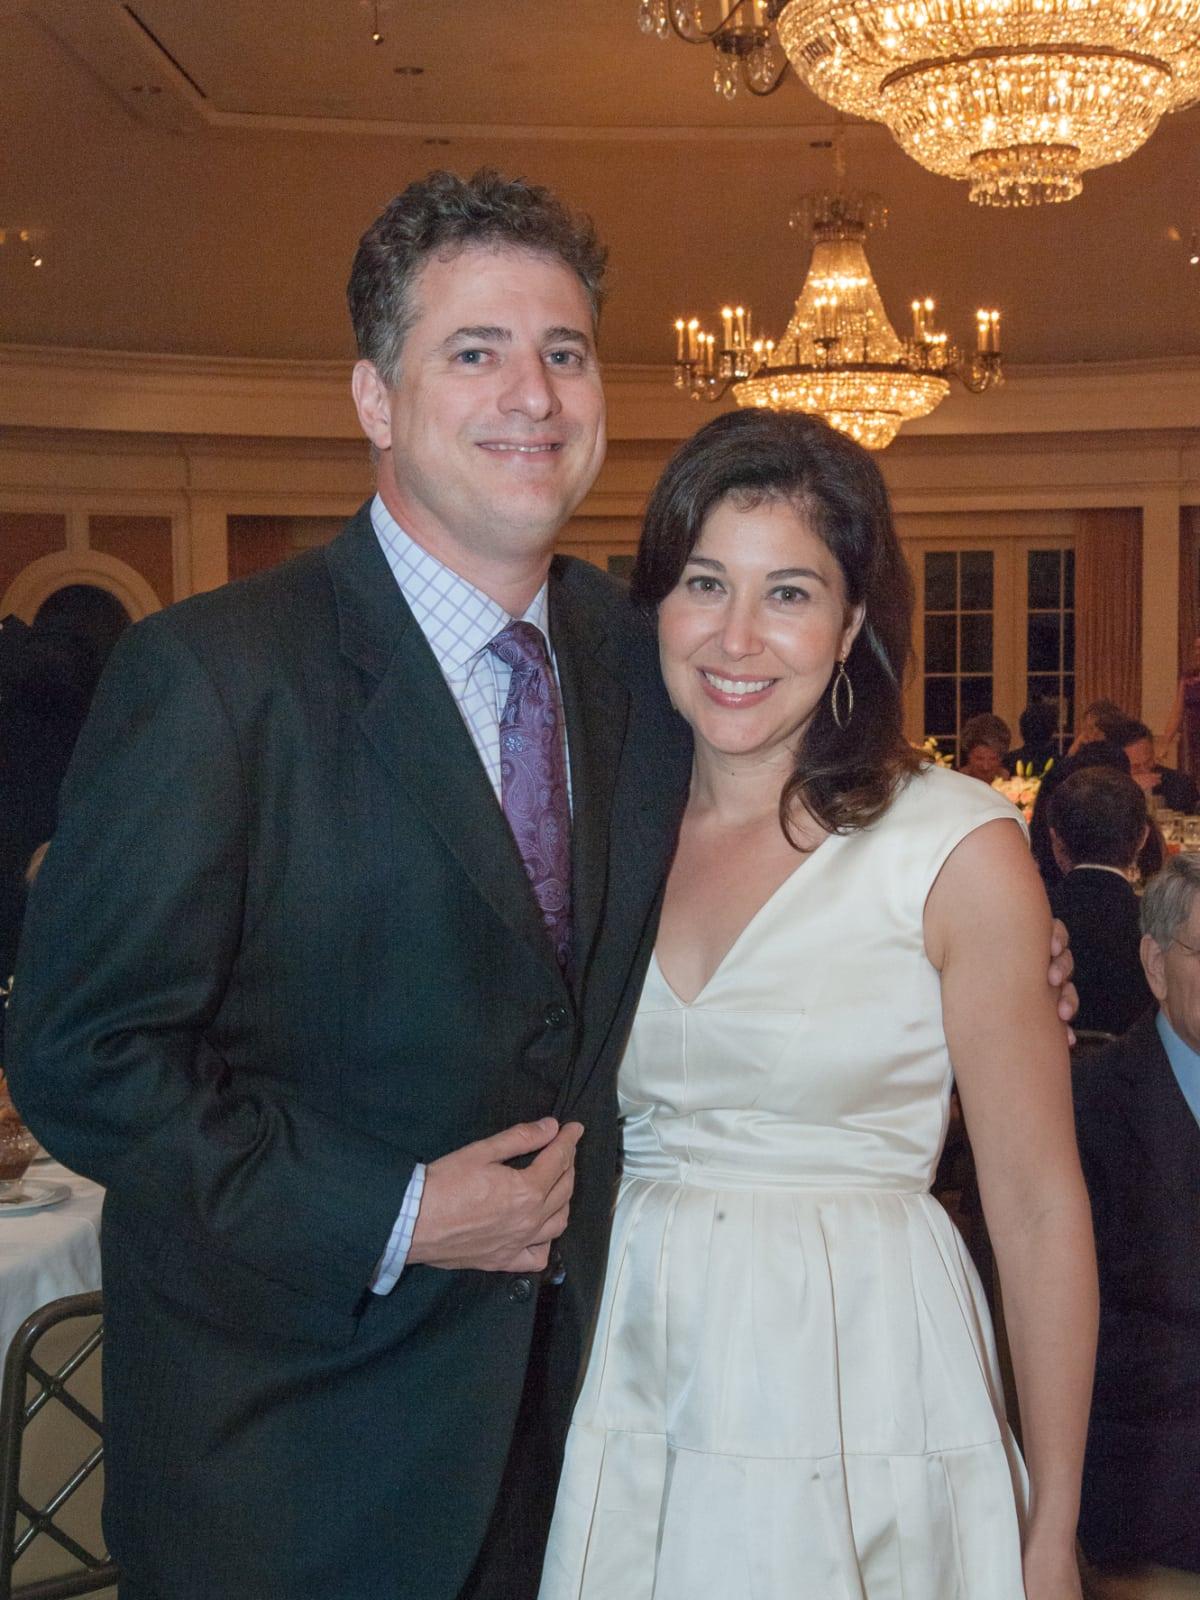 Houston, River Oaks Chamber Orchestra Gala, October 2015, Benjamin and Jennifer Fink